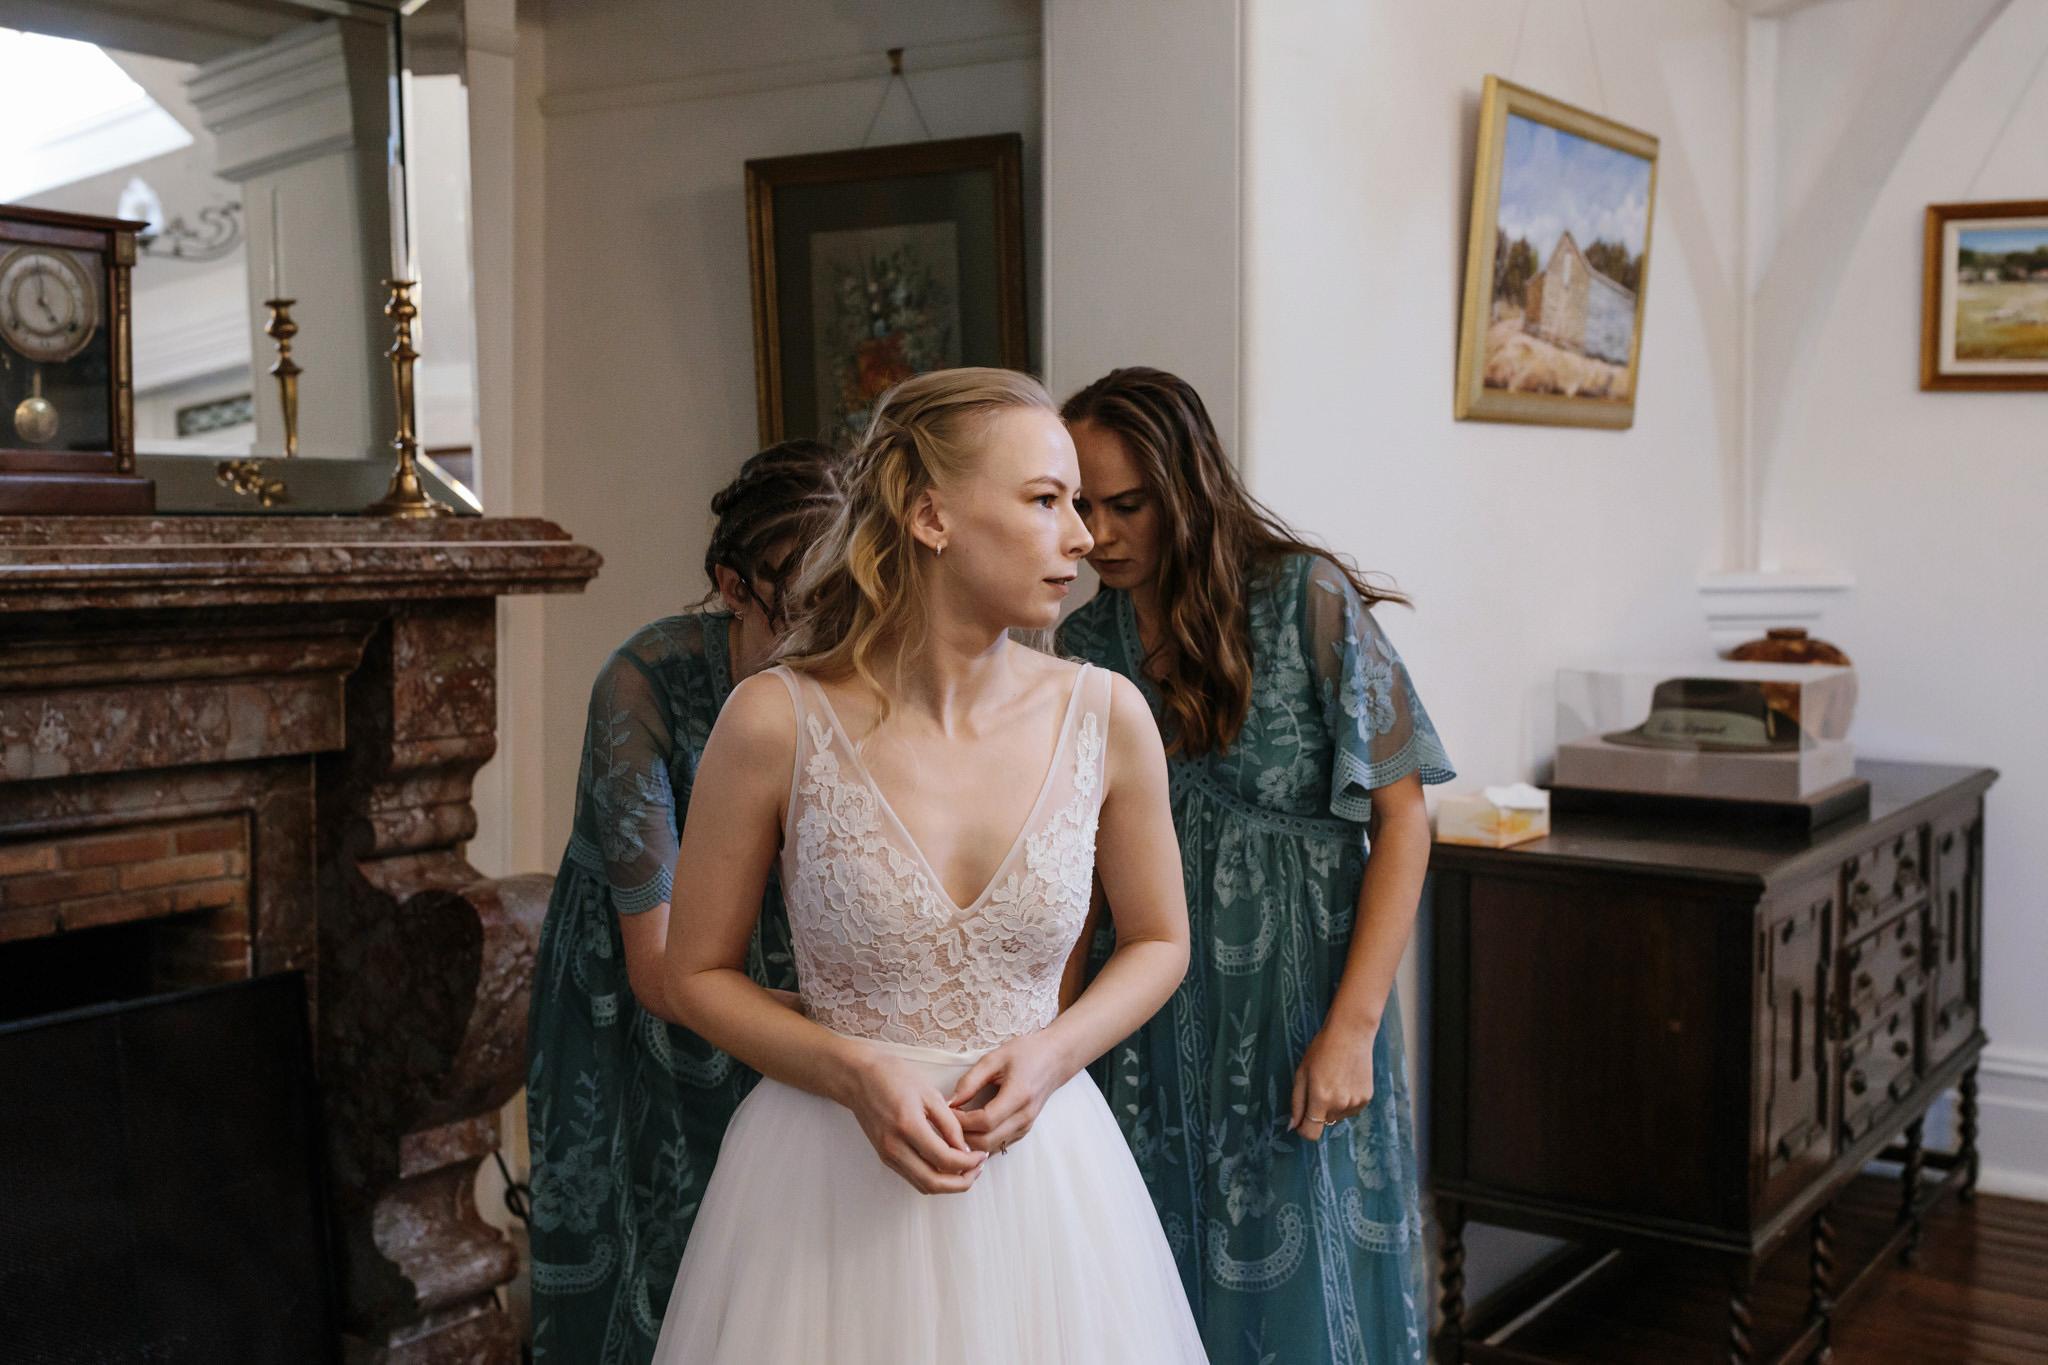 Erin_Latimore_Mudgee_Canberra_Wedding_Photographer_Tuggeranong_Homestead_033.JPG